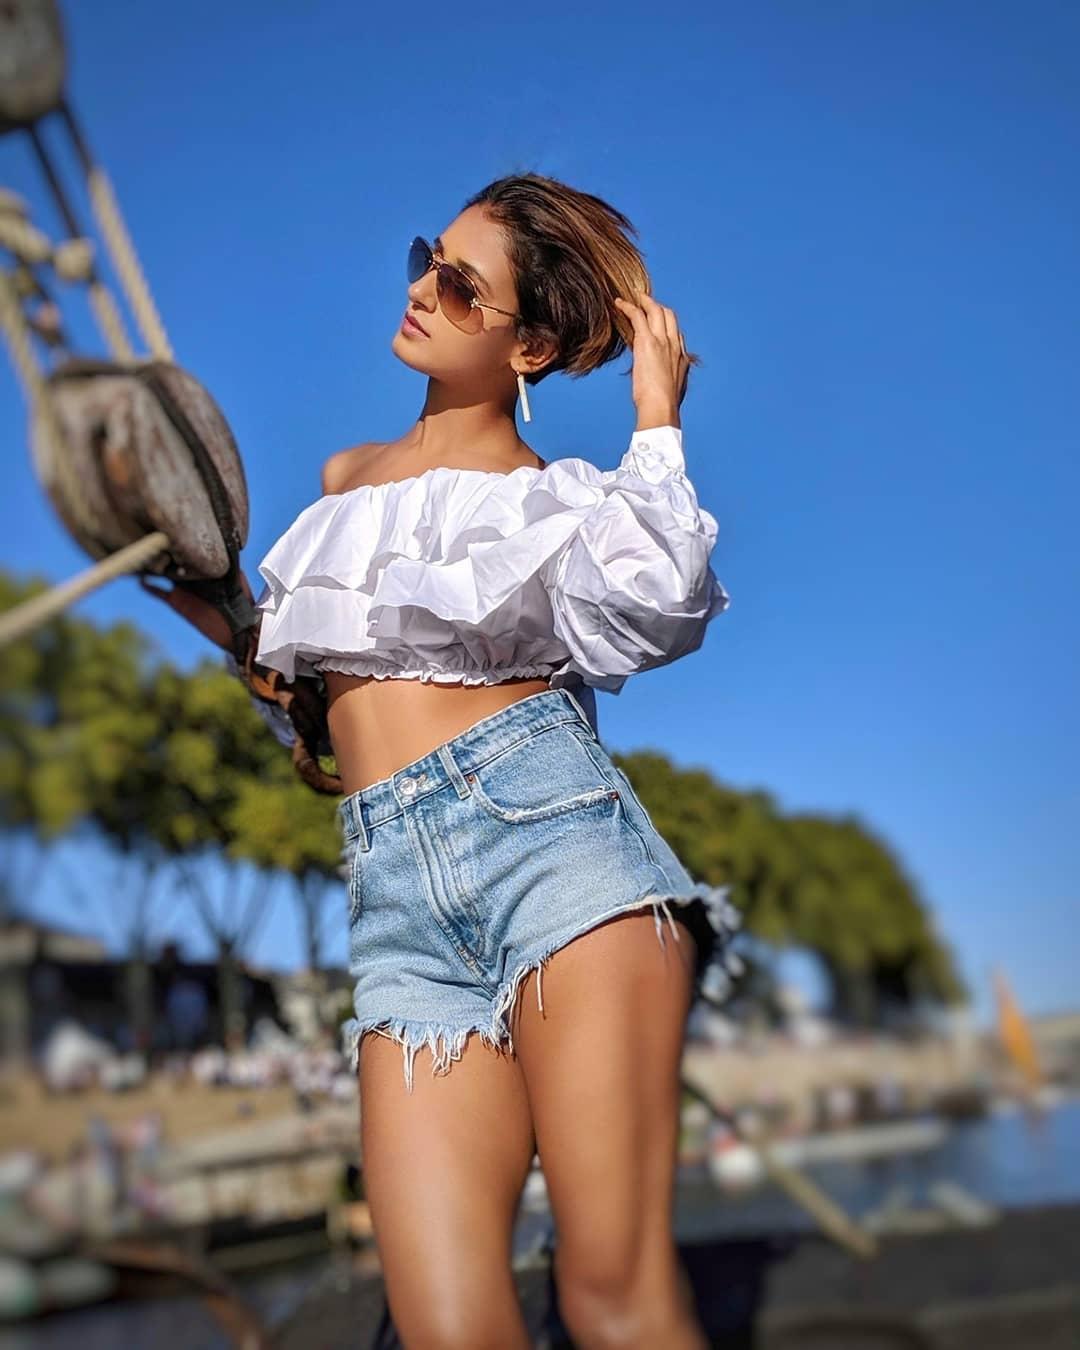 Shakti-Mohan-hot-bikini-top-and-denim-shorts-images